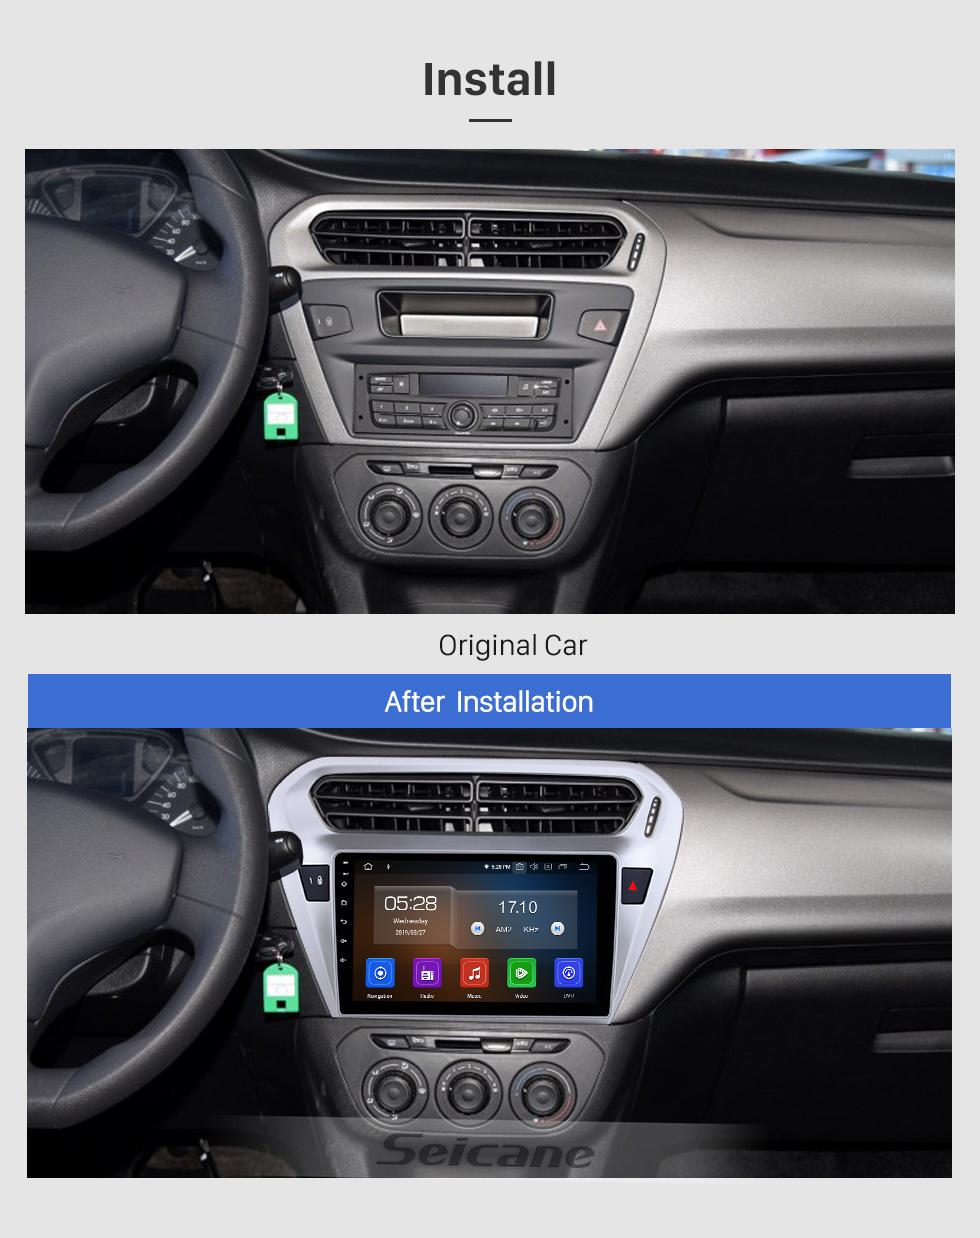 Seicane 9 Zoll 2013 Peugeot 301 Citroen Citroen Citroen Citroen Citroen C-Elysee Android 9.0 Radio GPS HD 1024 * 600 Touchscreen 4G WIFI Lenkrad OBD2 RDS Steuerspiegel Link Bluetooth